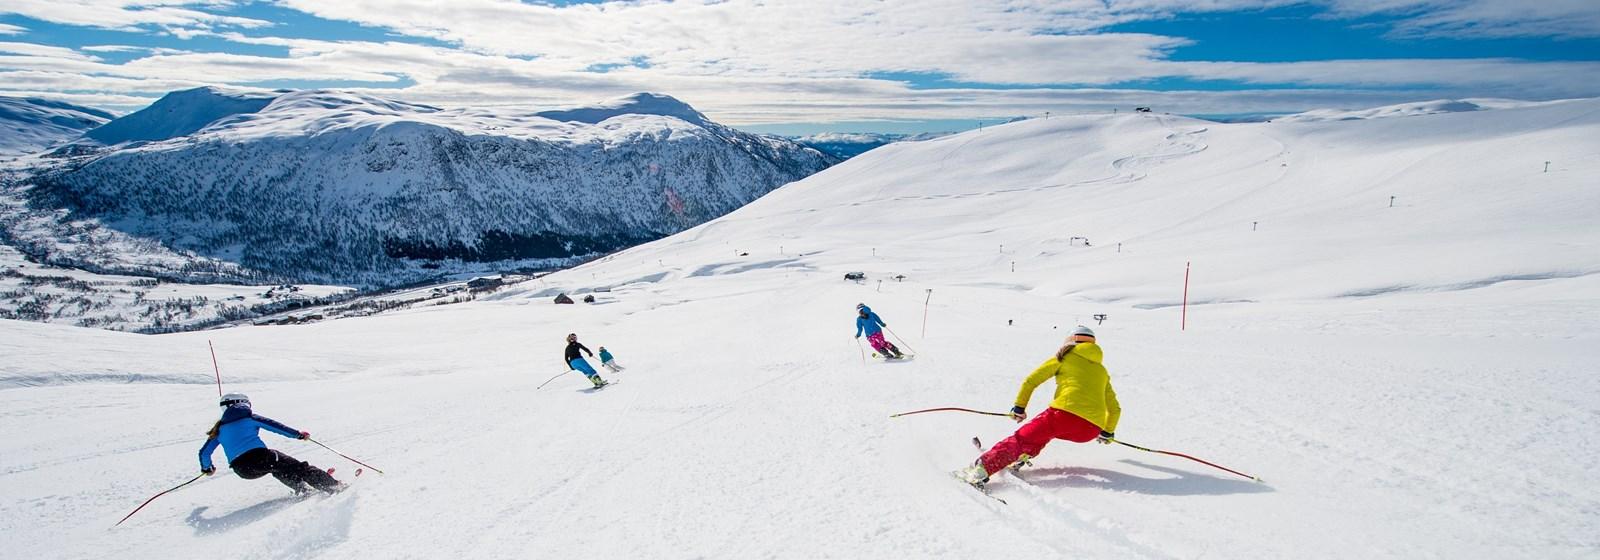 Ski Touring Norway April